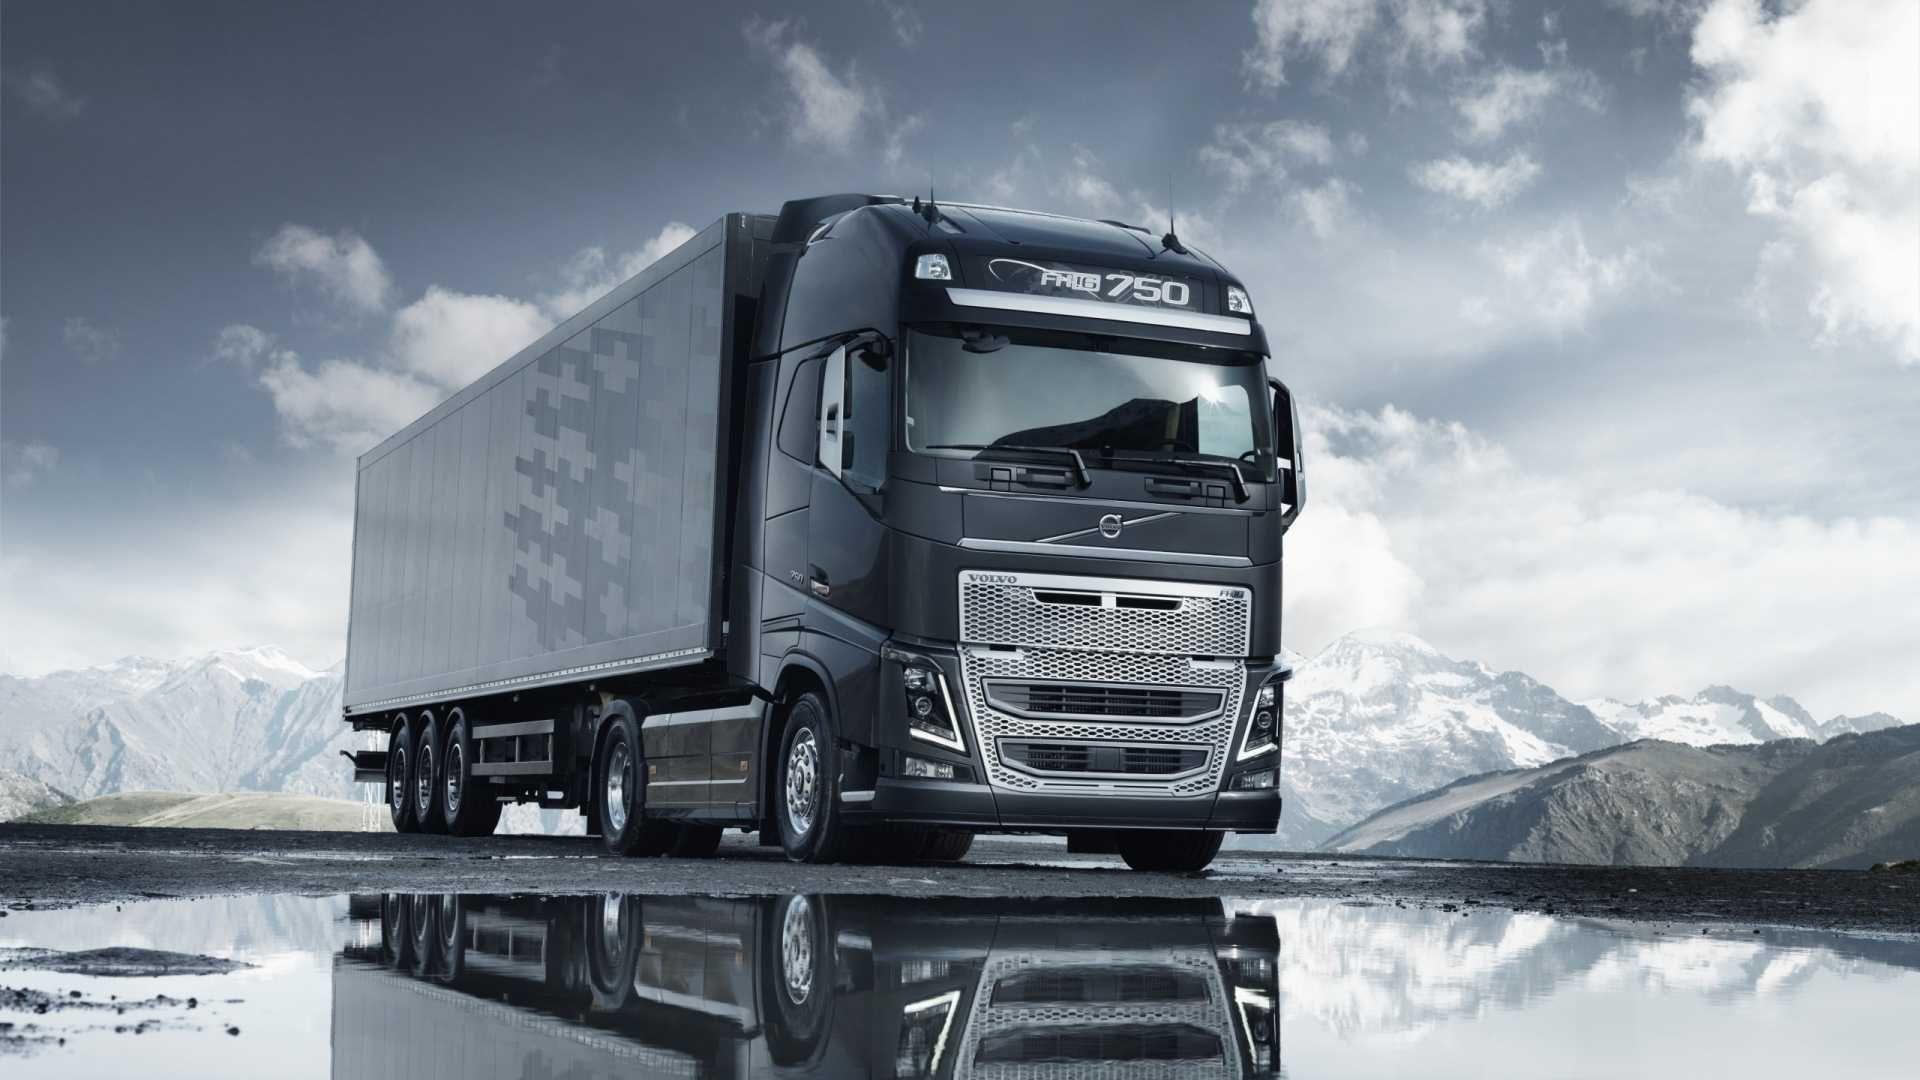 15 Best Trucks In The World Cool Trucks Pictures Volvo Trucks Volvo Trucks